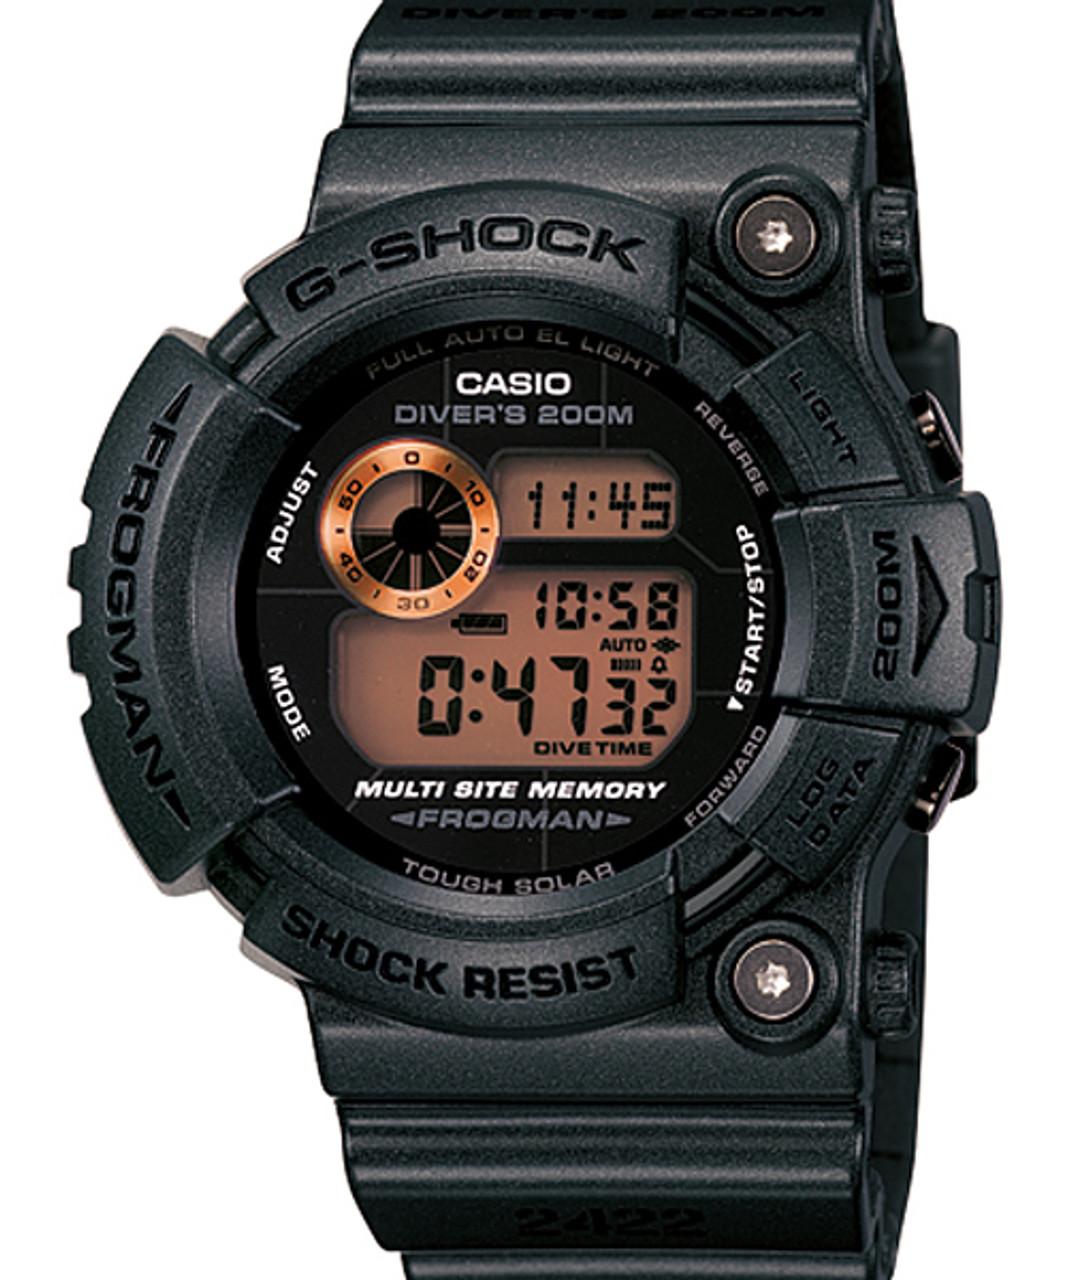 Rusty Black Casio Frogman Watch